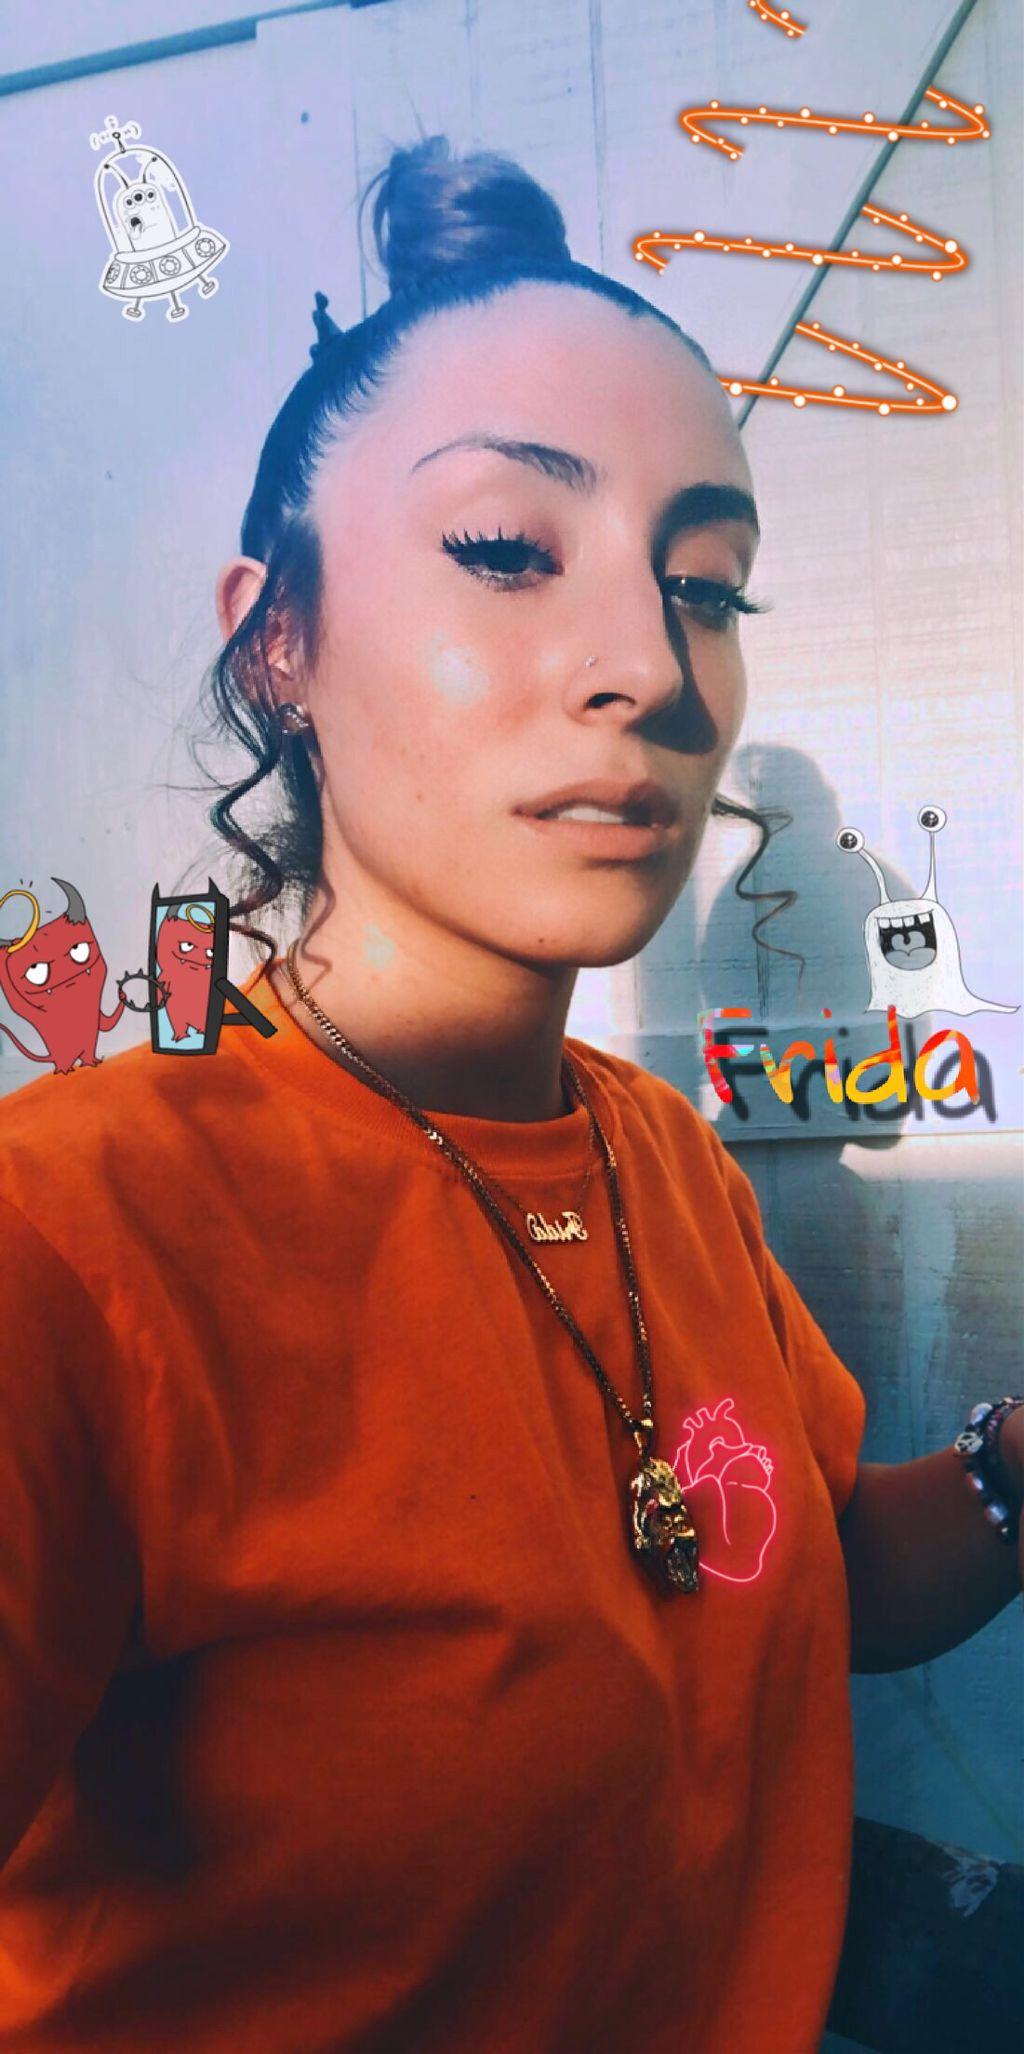 #freetoedit #fridax #fridaxitlalhic #frida #orange #chains #ape #monsters #aliens #devil #prettygirl #finegirl #bun #curls #swirls #mirror #heart #neon #art #photography